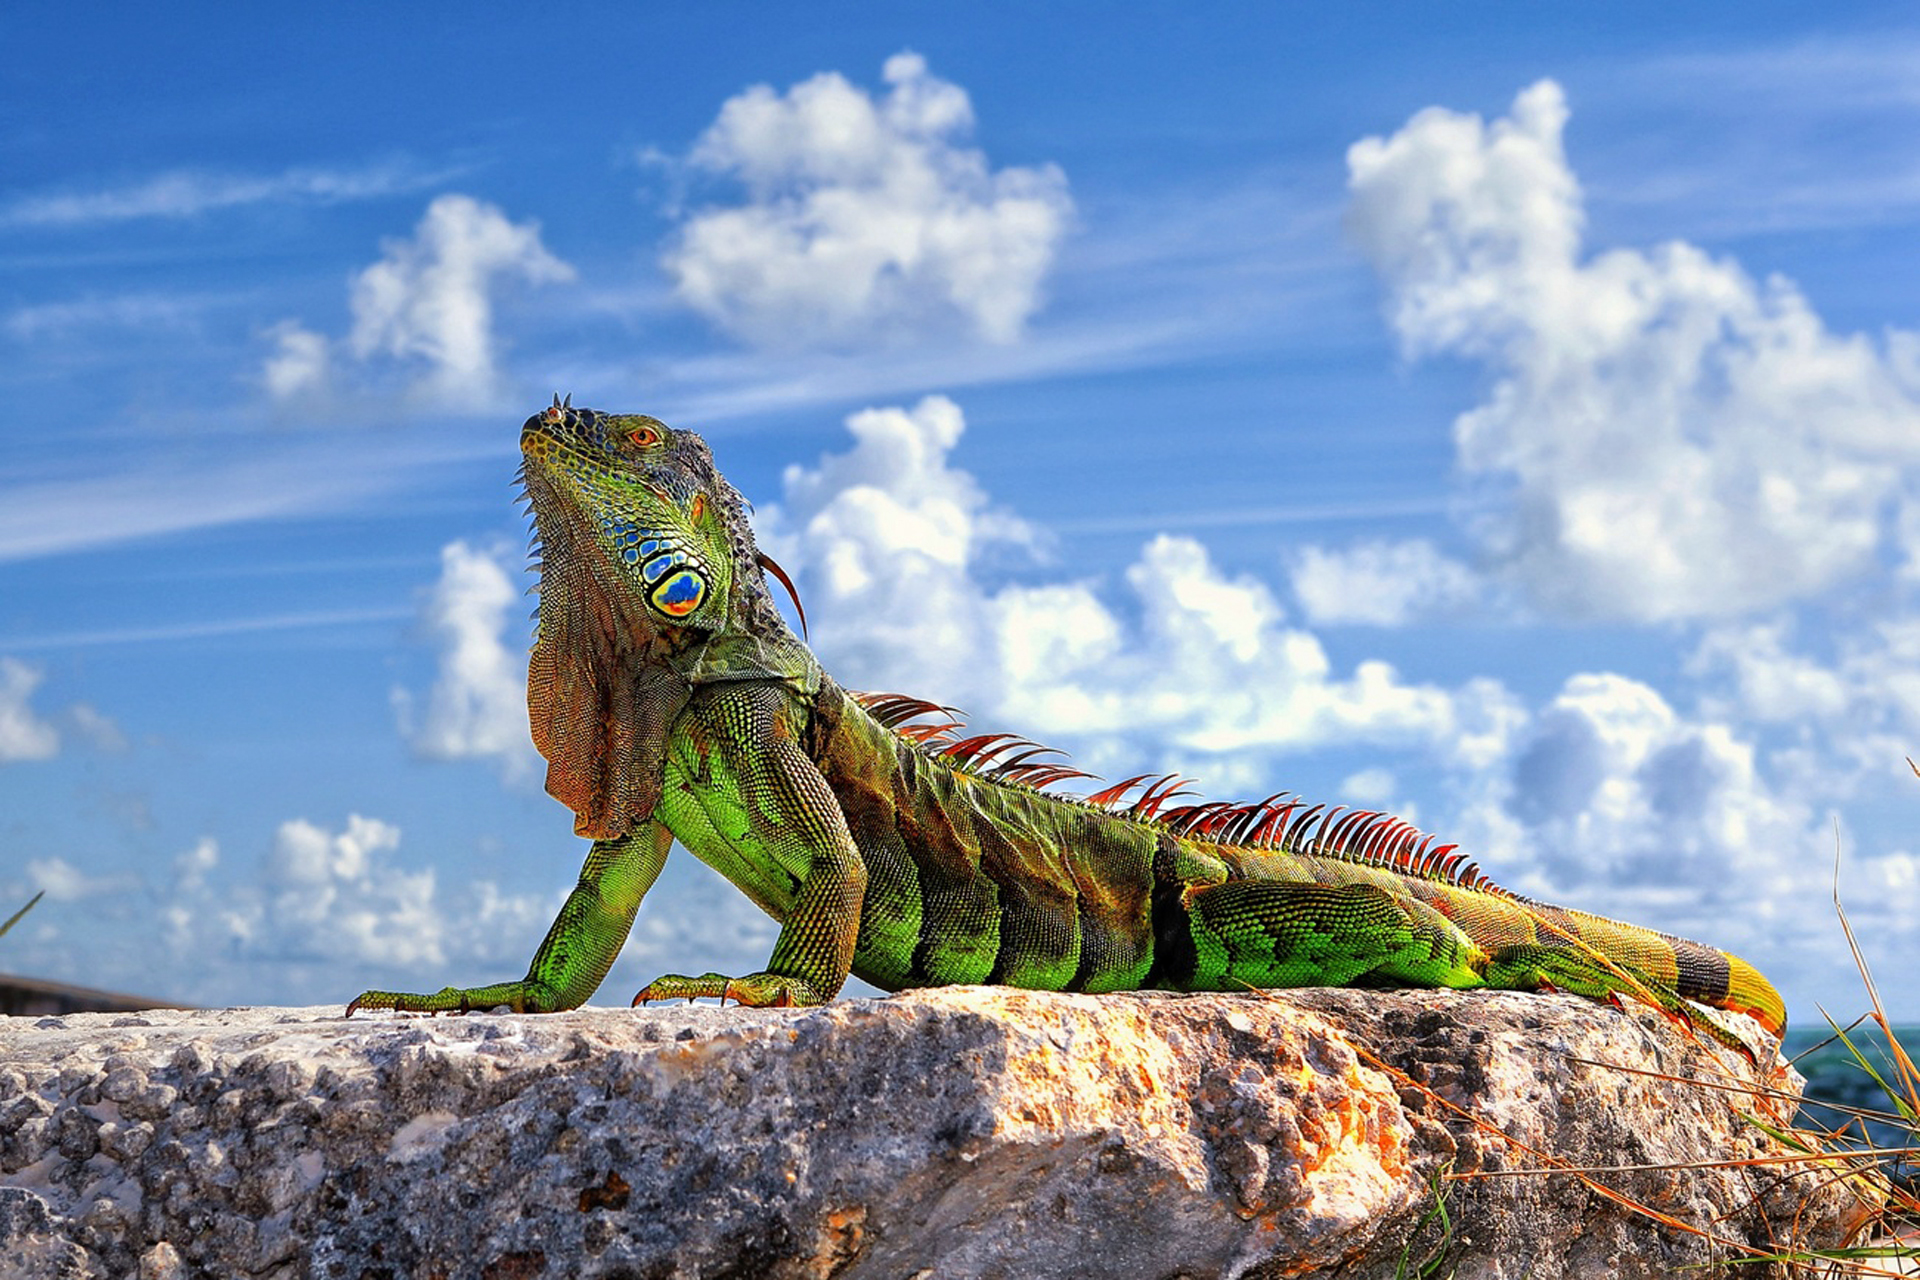 Iguana HD Wallpaper Background Image 1920x1280 ID357994 1920x1280